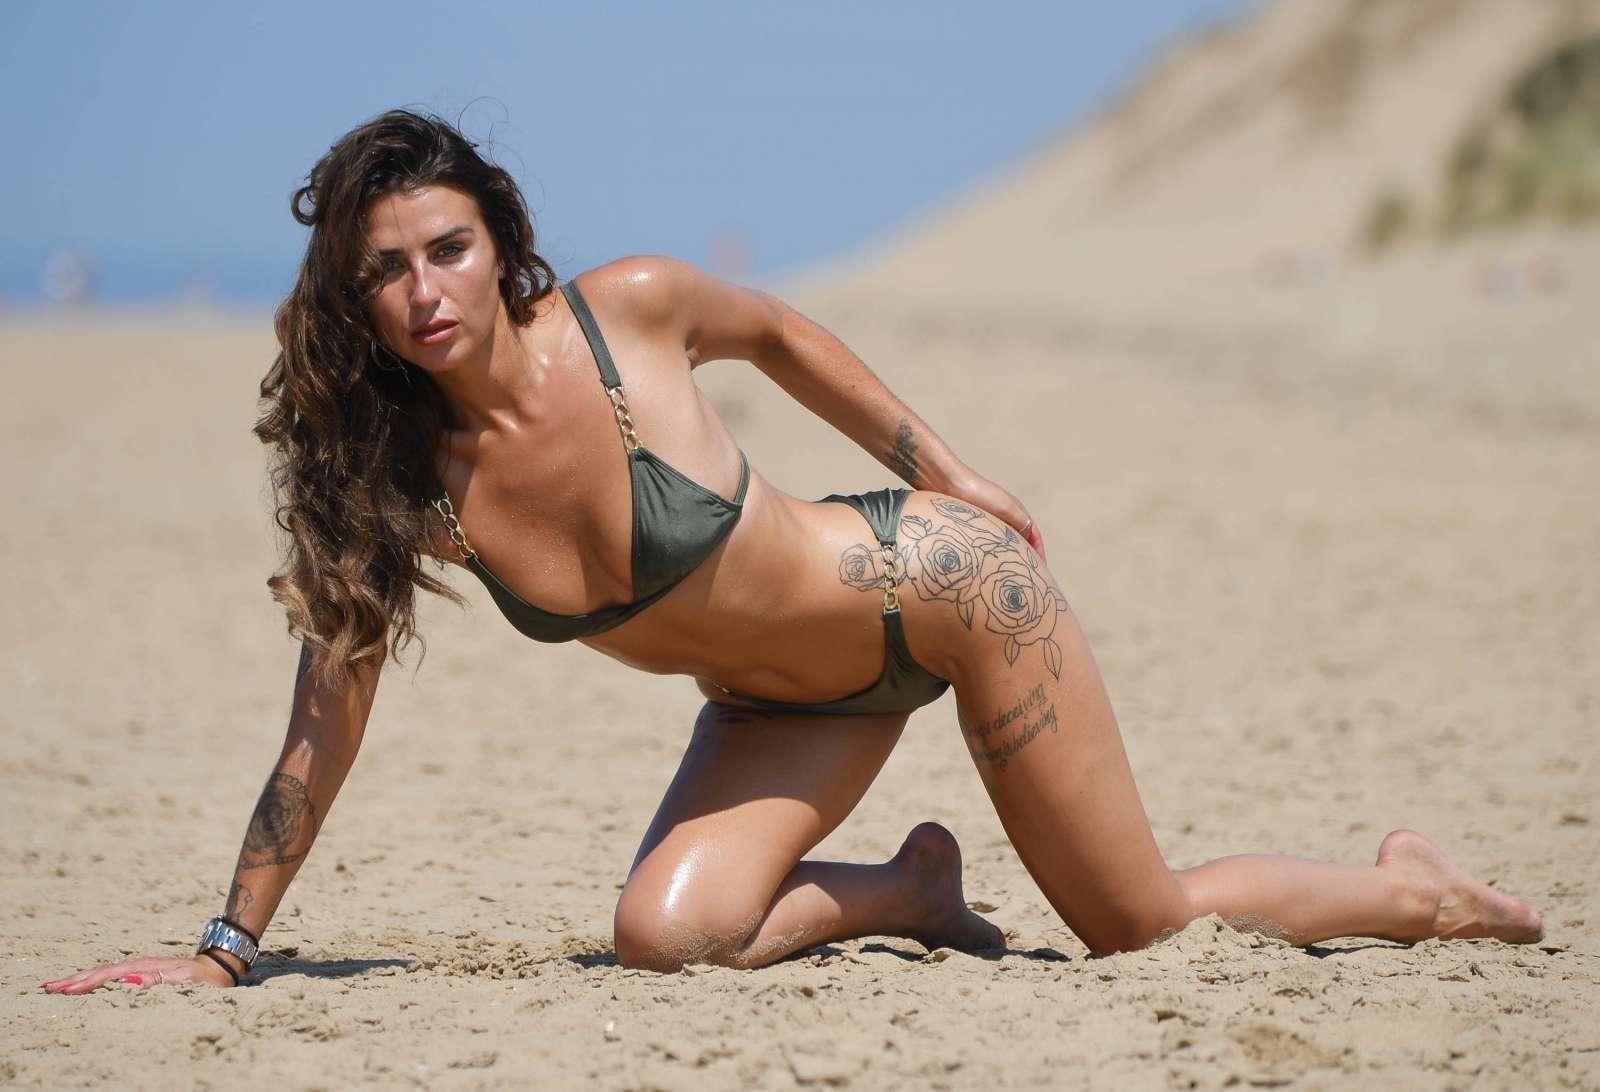 Jennyp bikini model, black pussy squirts